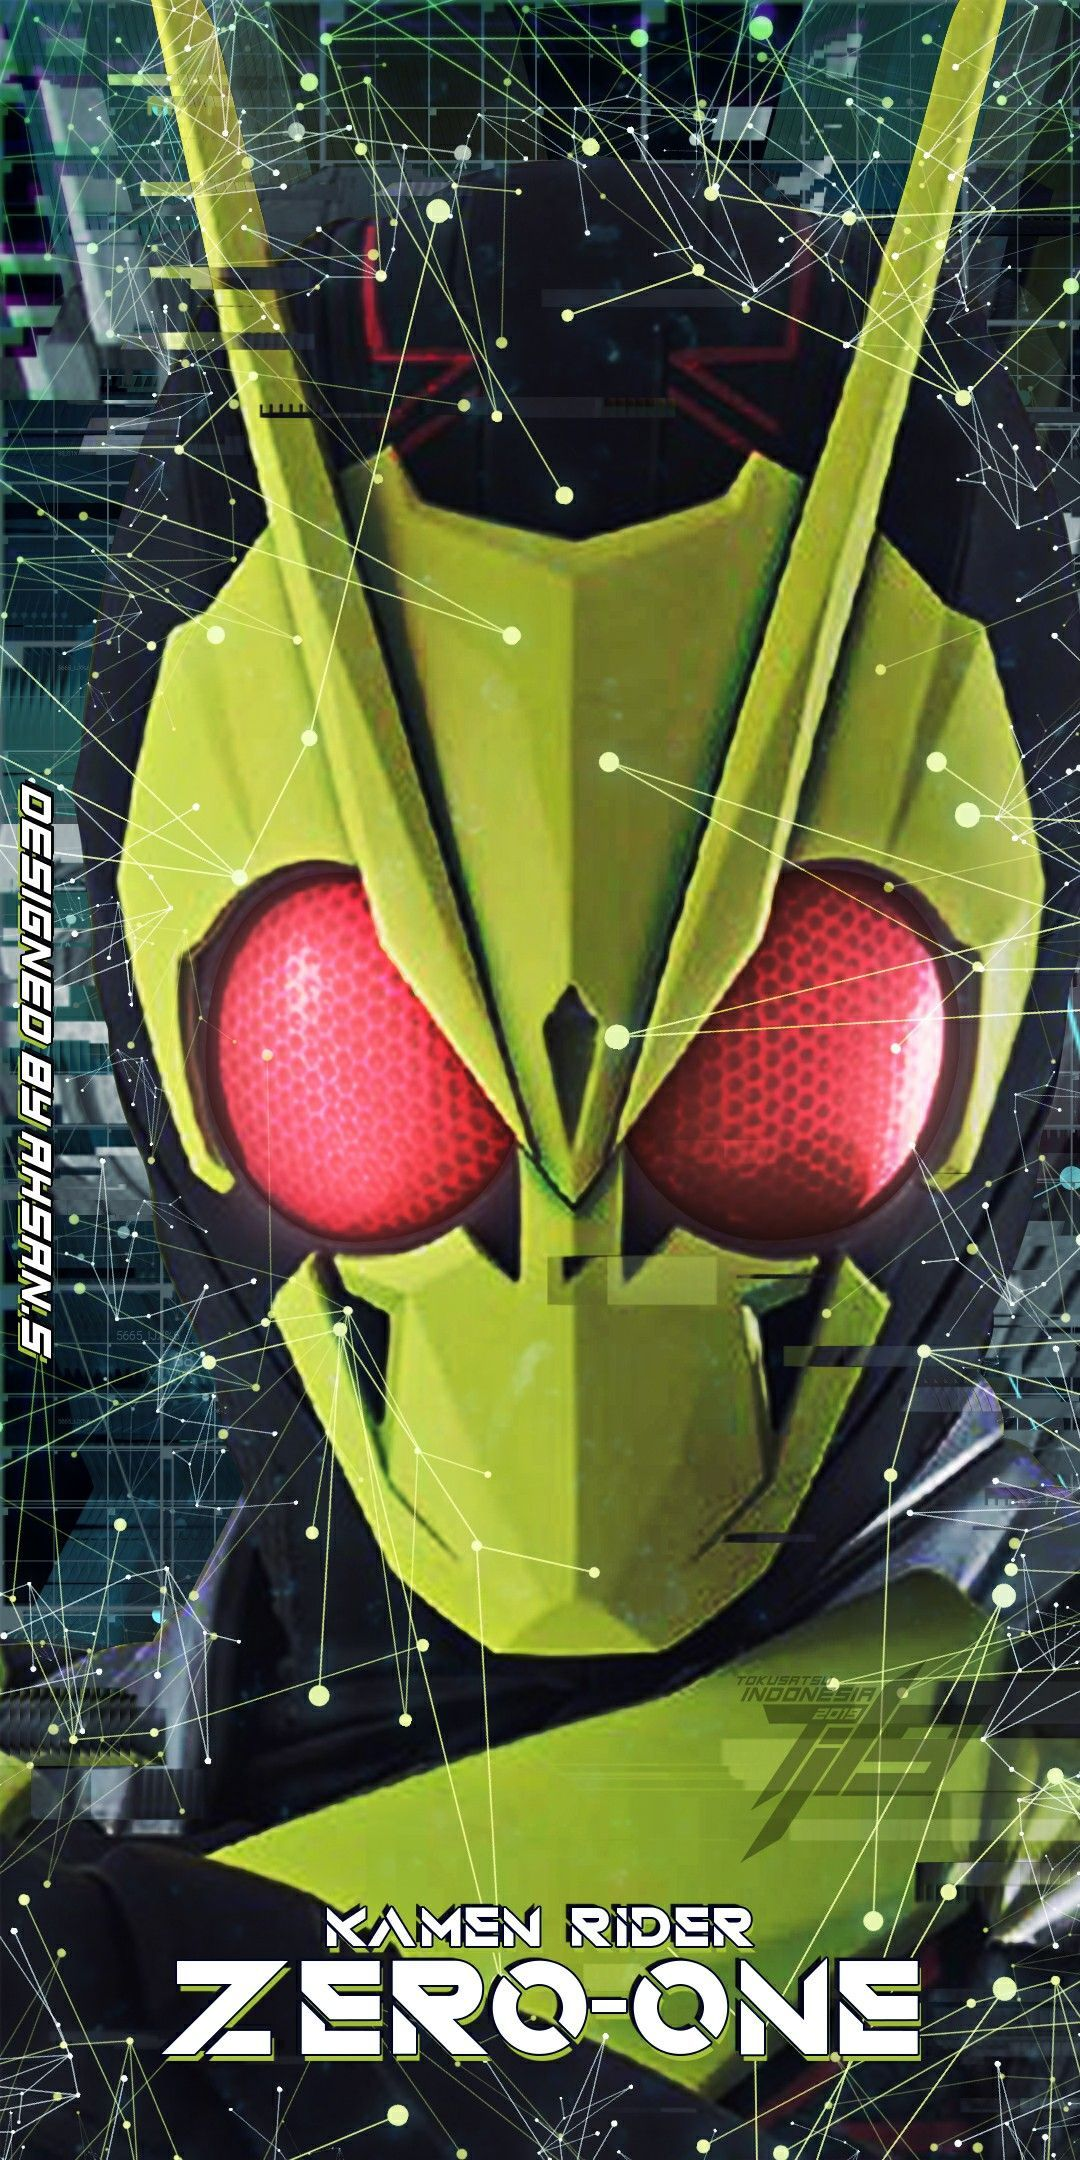 kamen rider zero one rising hopper スーパーヒーロー 仮面ライダーファイズ 仮面ライダー